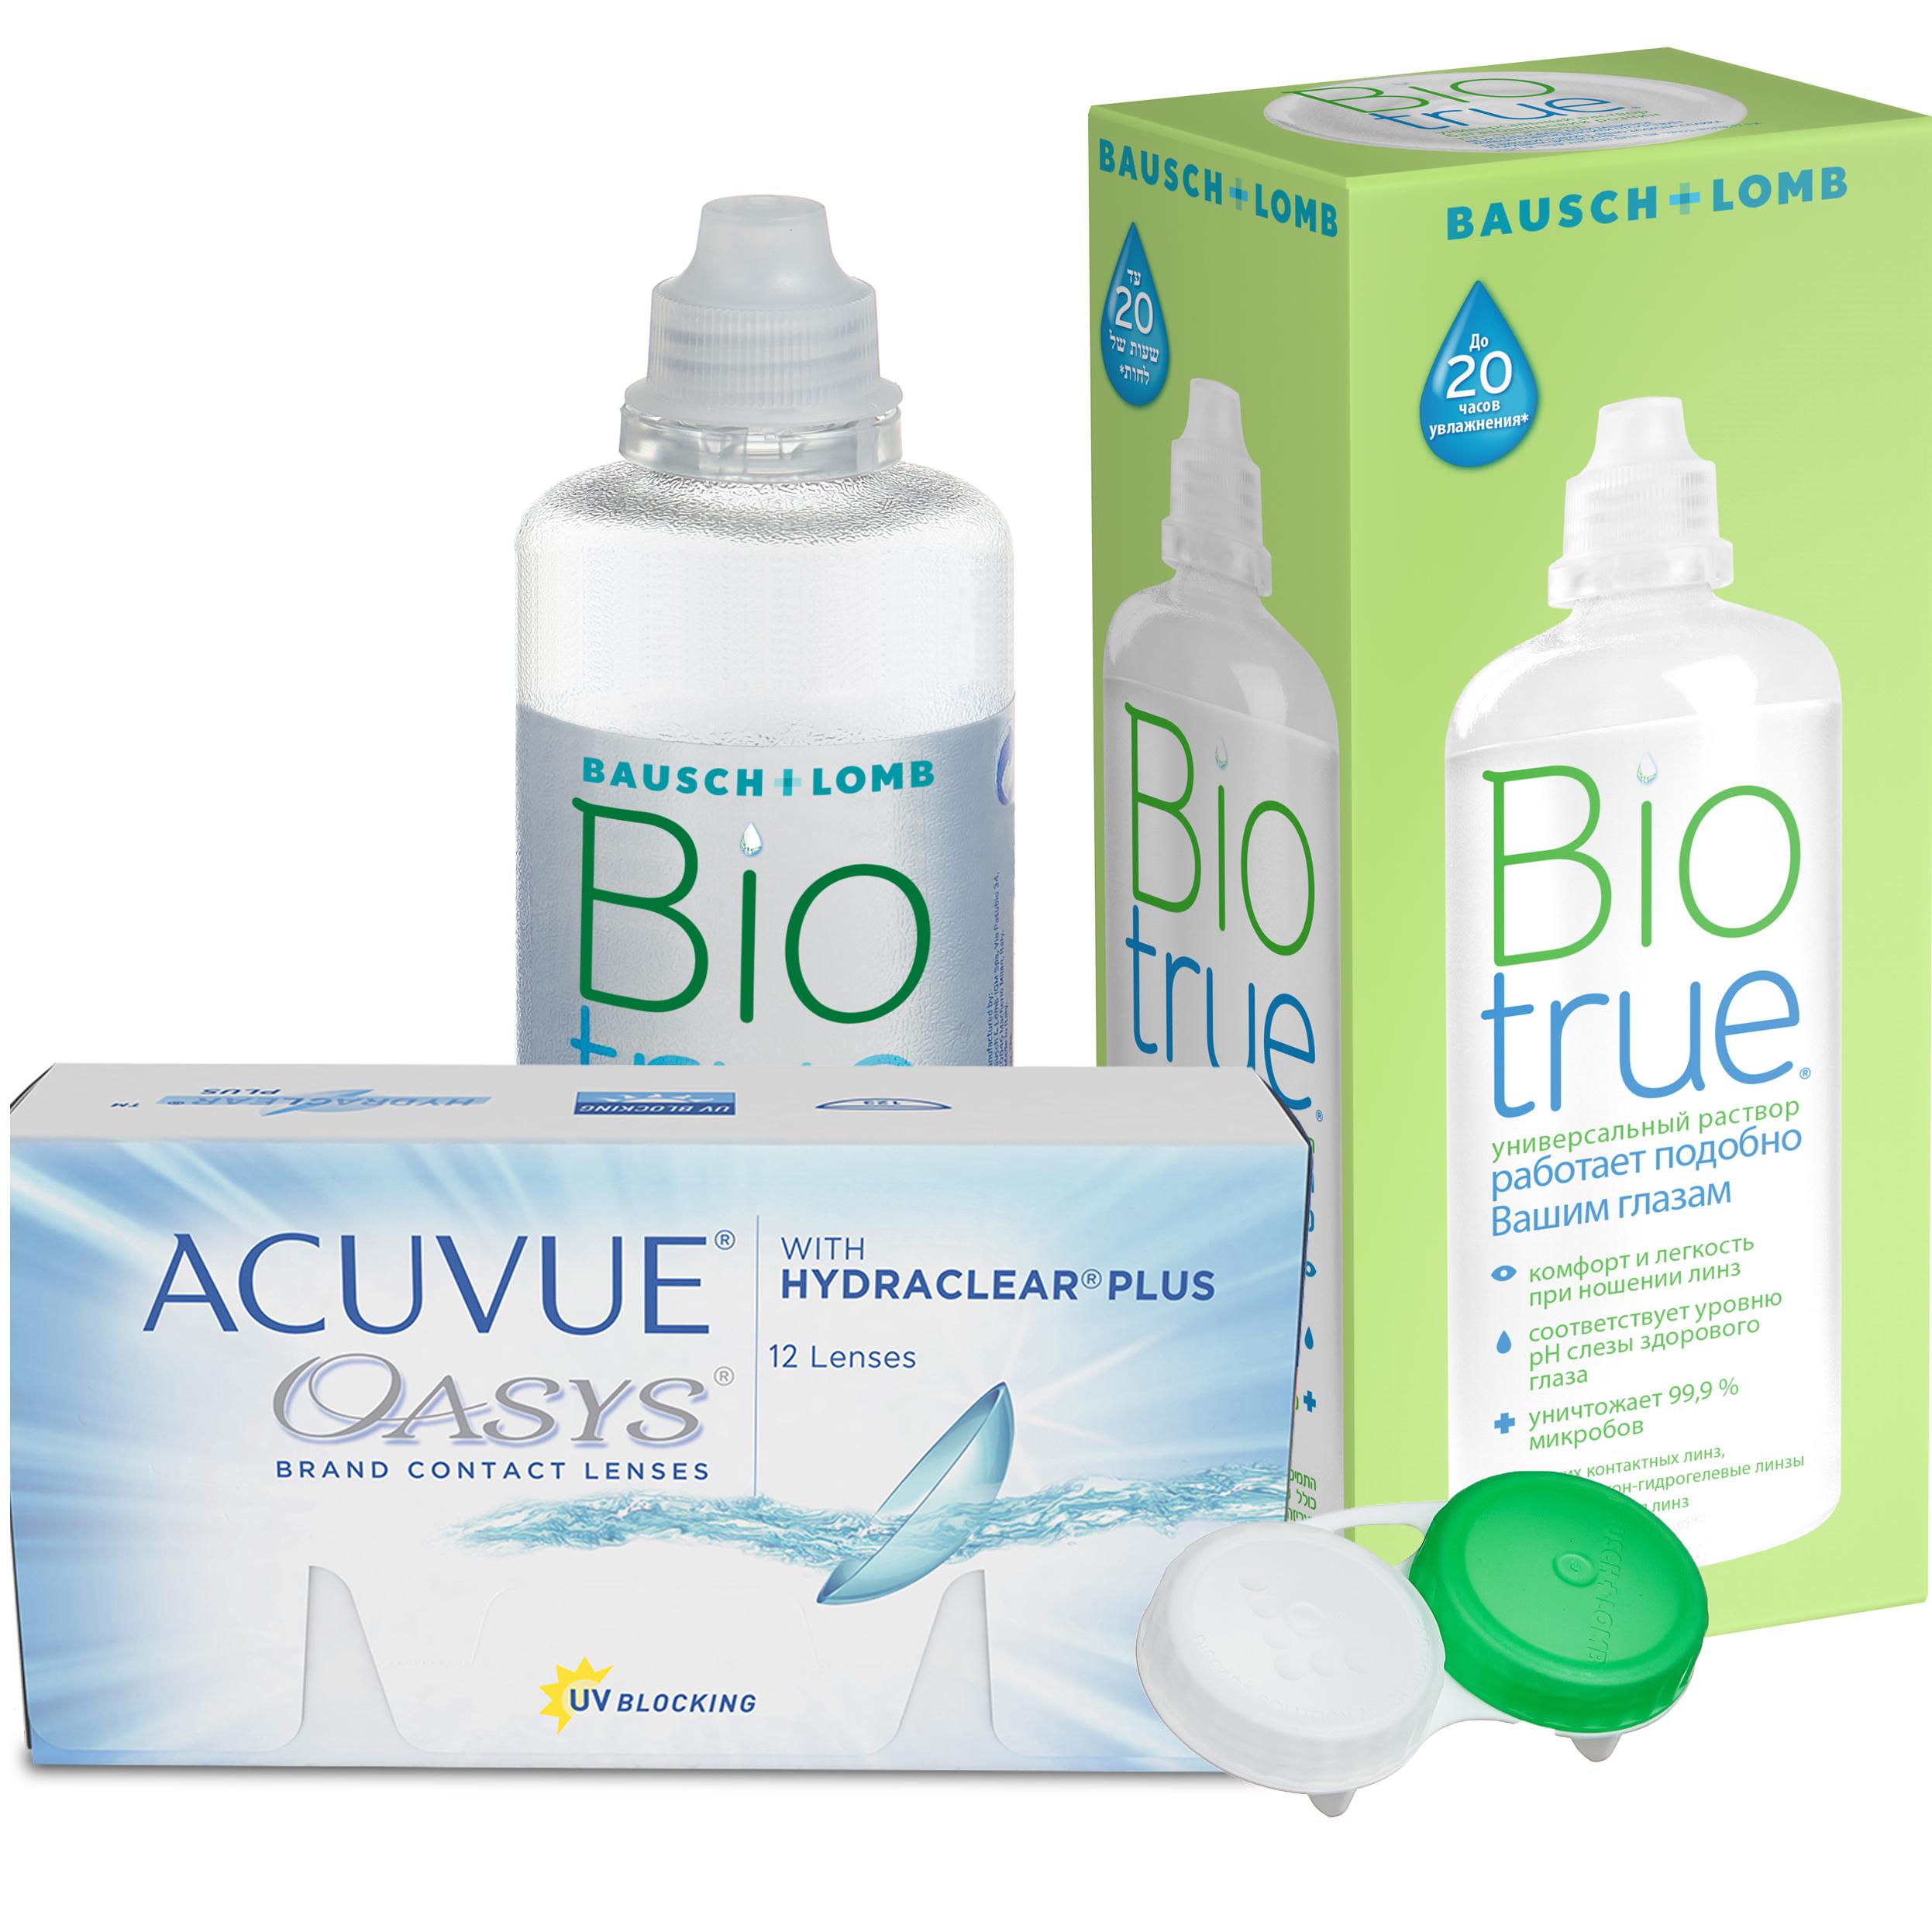 Купить Oasys with Hydraclear Plus 12 линз + Biotrue, Контактные линзы Acuvue Oasys with Hydraclear Plus 12 линз R 8.4 +6, 00 + Biotrue 300 мл